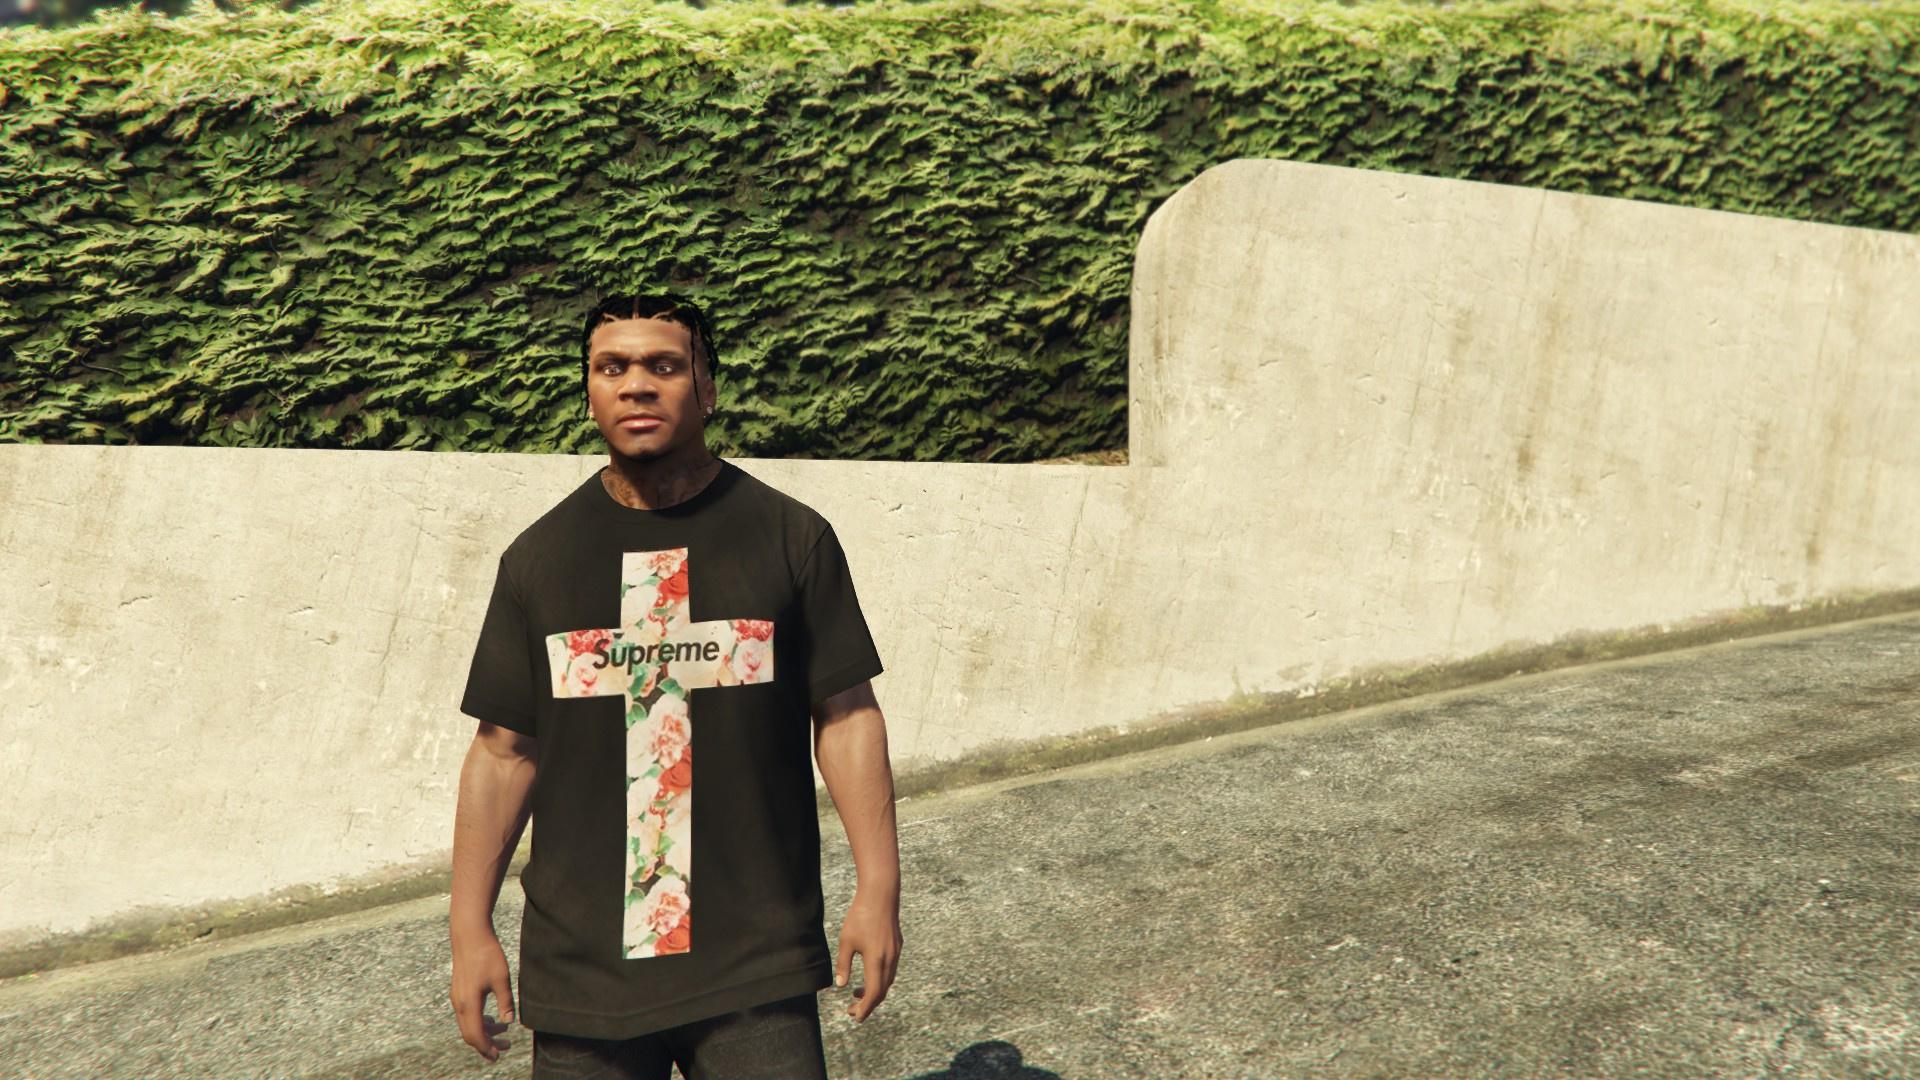 Supreme Floral Cross T Shirt For Franklin Gta5 Modscom